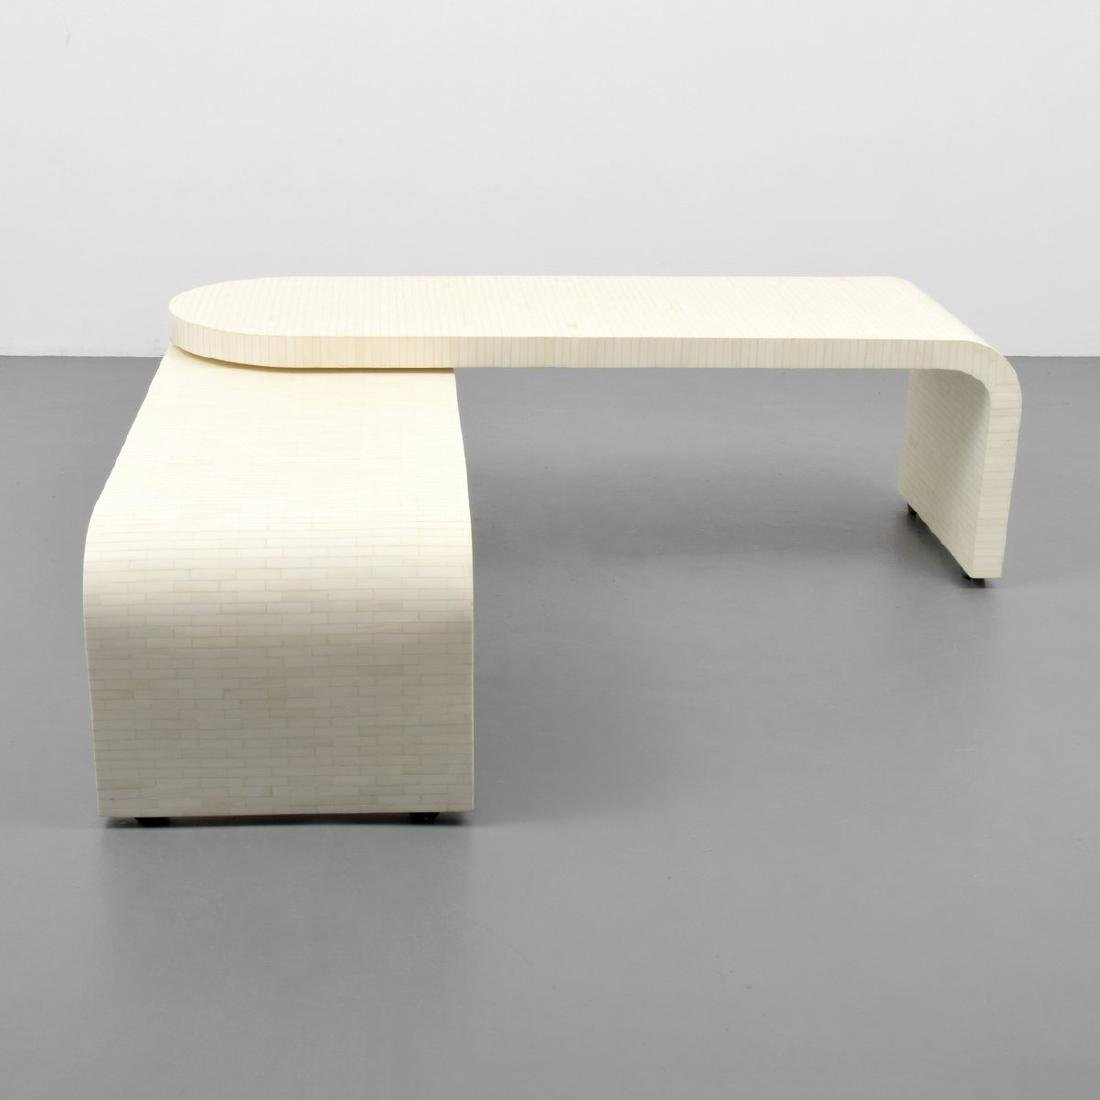 Tessellated Bone Coffee Table, Manner of Karl Springer - 5